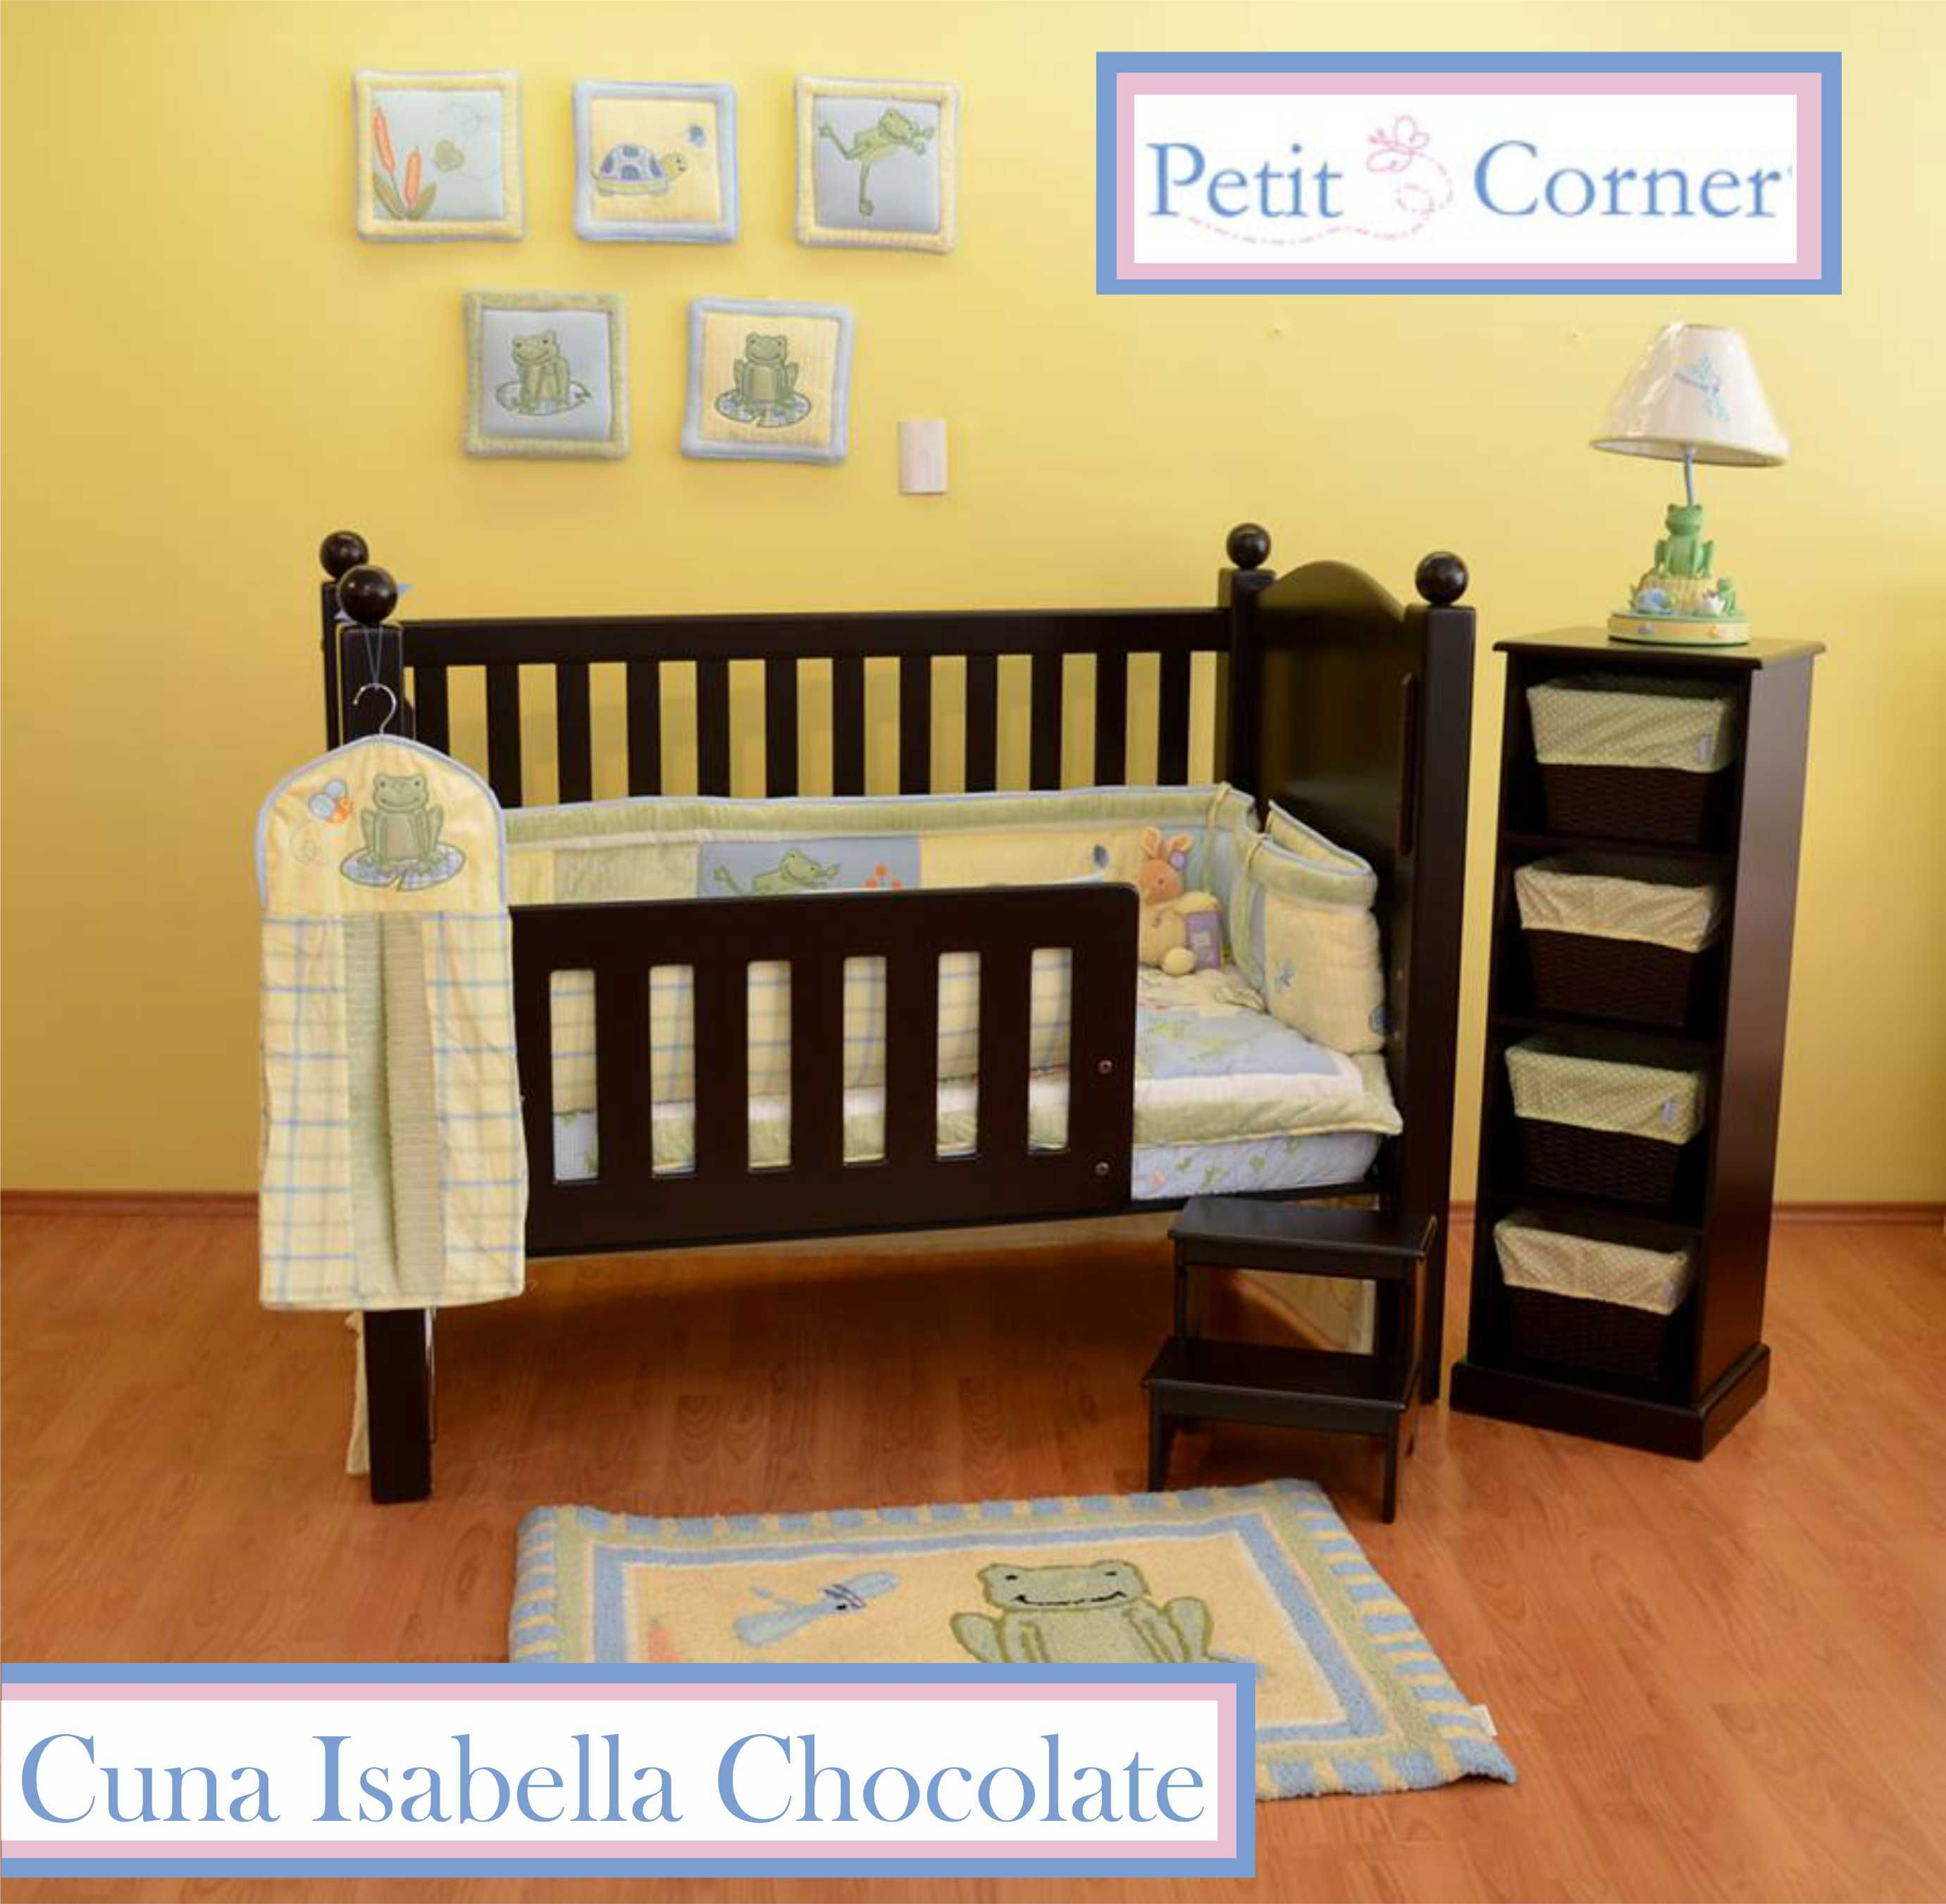 Cuna Isabella Chocolate Bebe Pinterest Chocolates Muebles  # Muebles Petit Corner